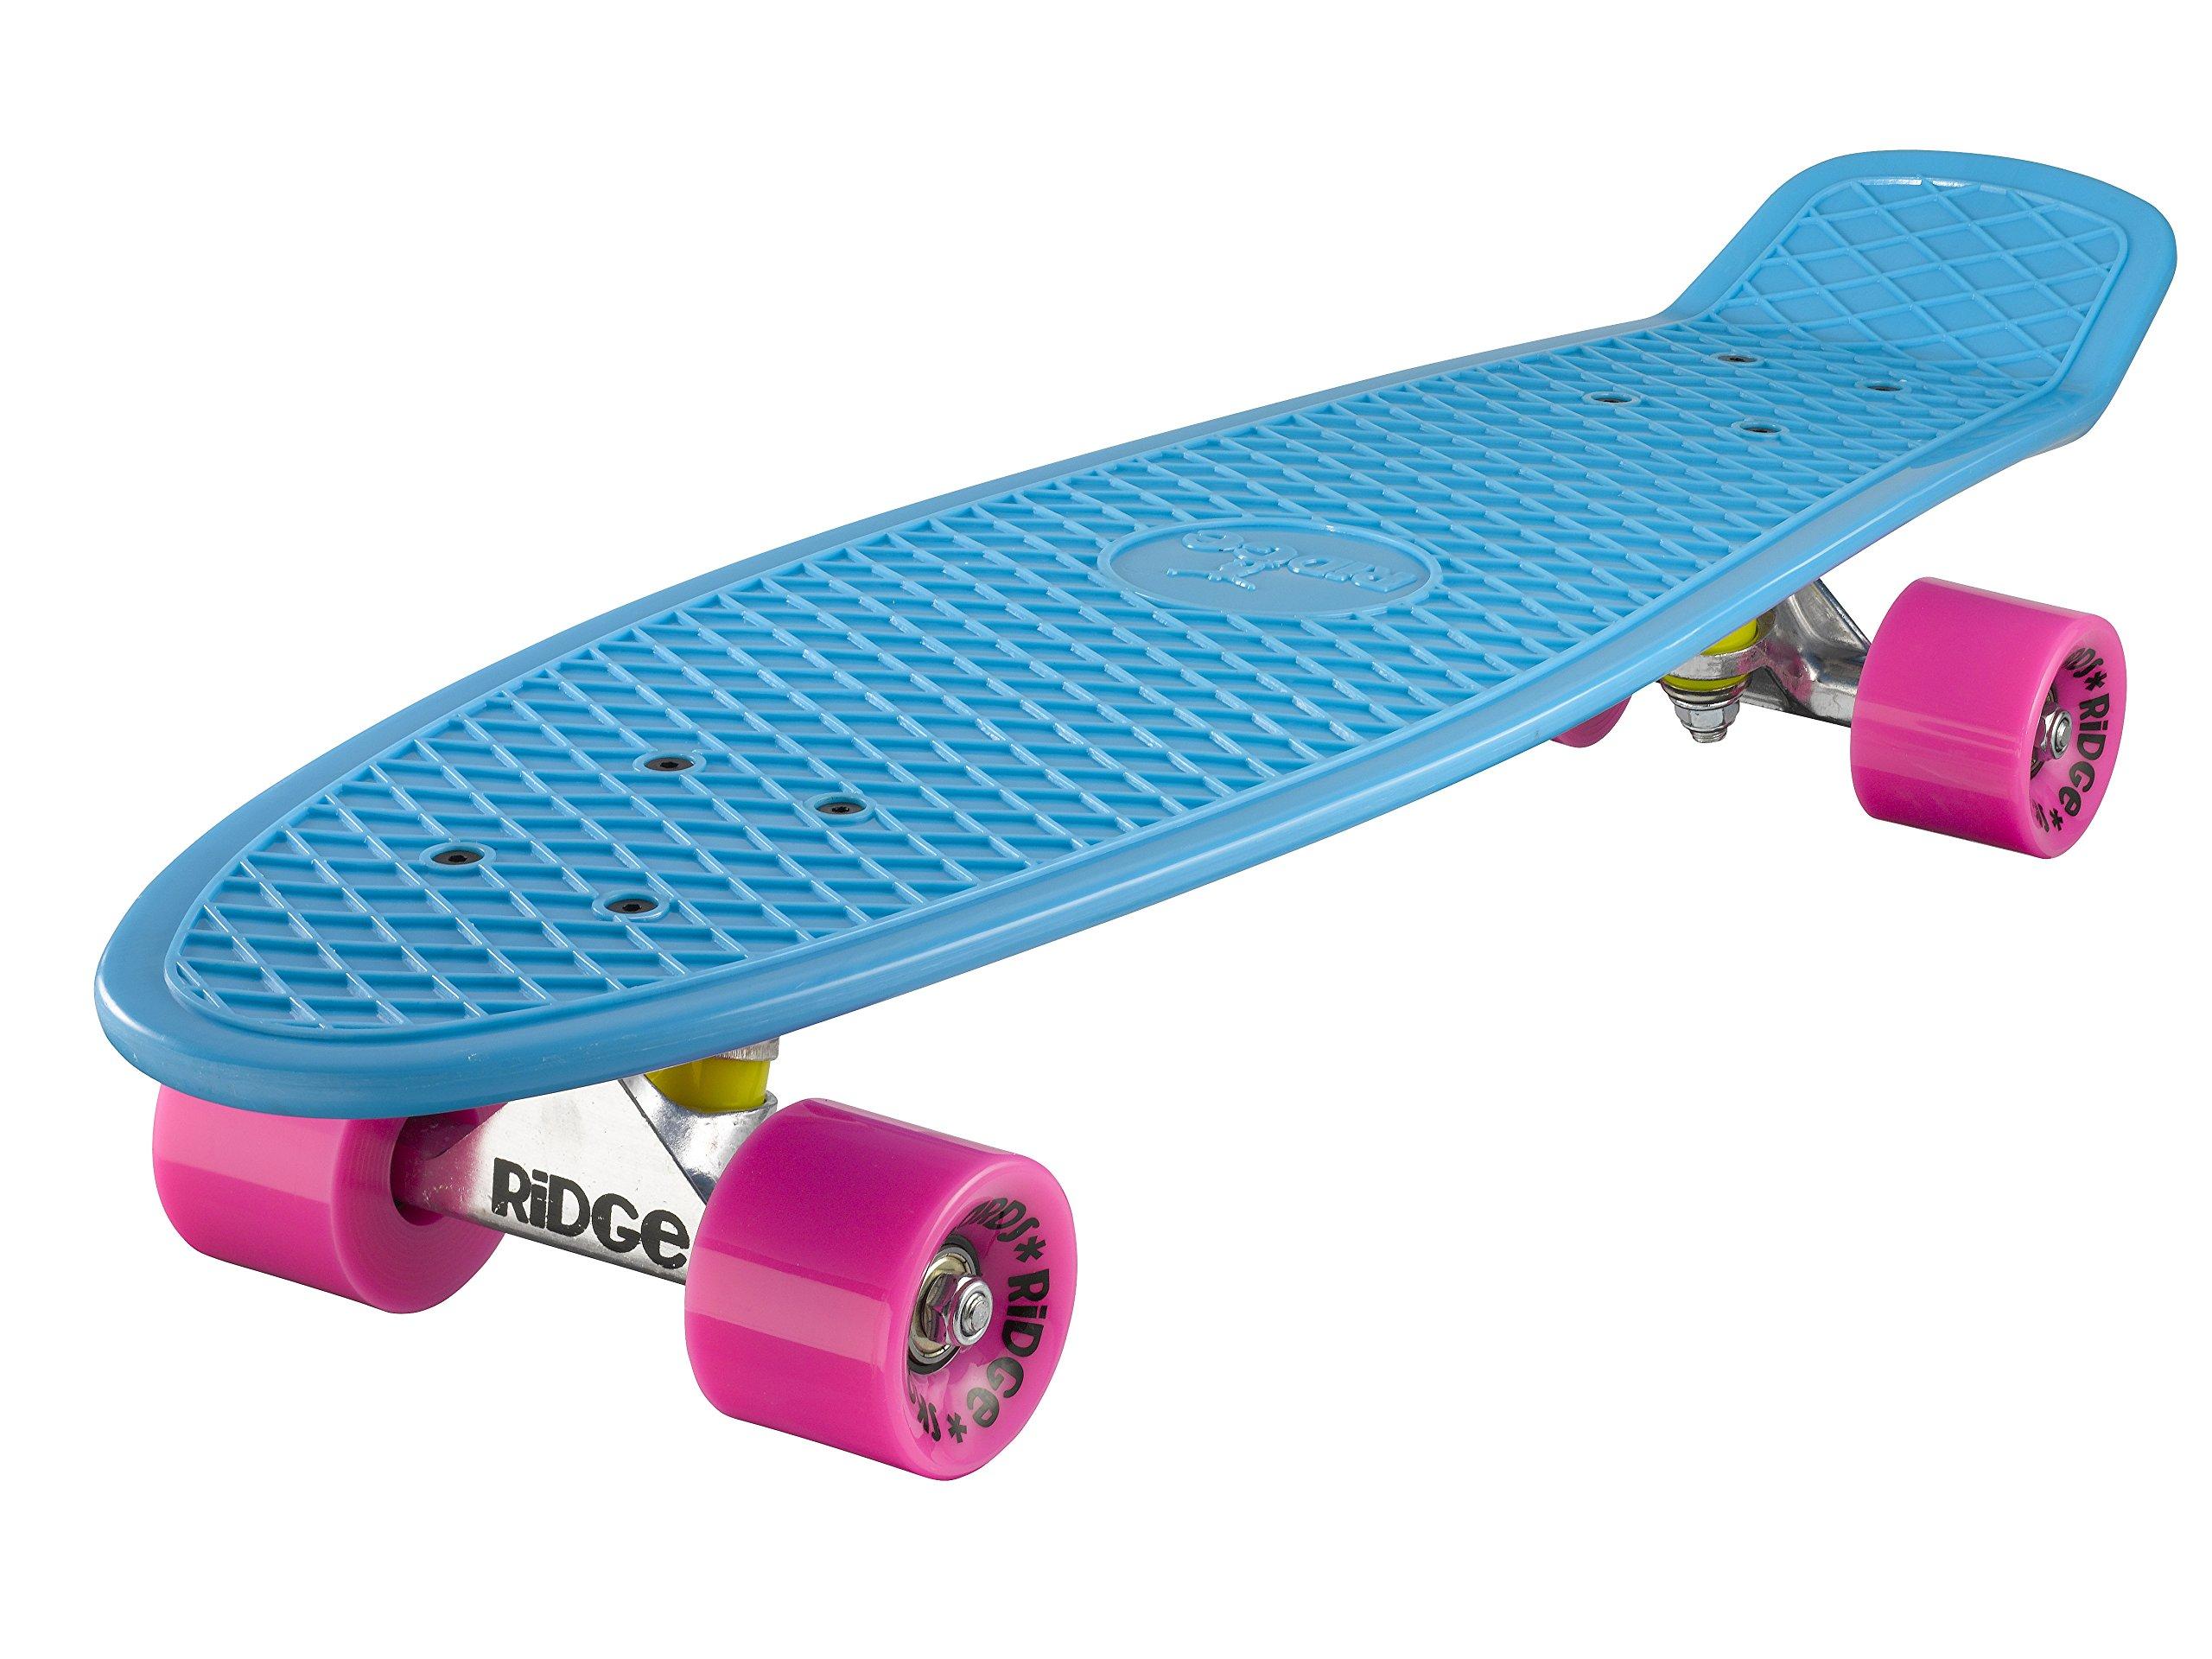 Skateboarding Sports & Outdoors 27 Inch Skateboarding ...